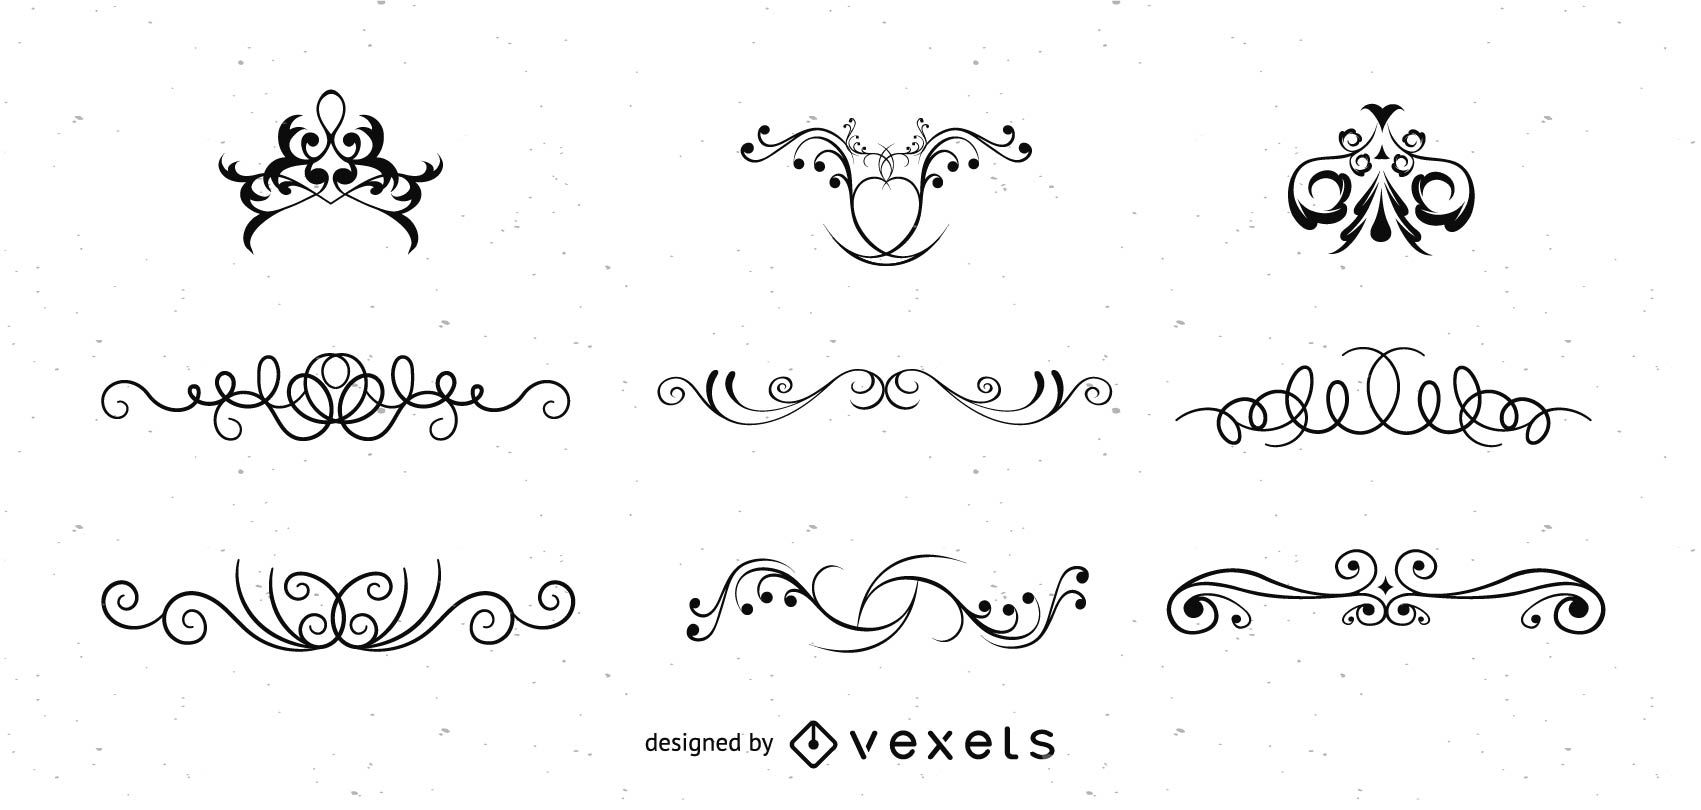 1701x810 Ornate Vector Swirls